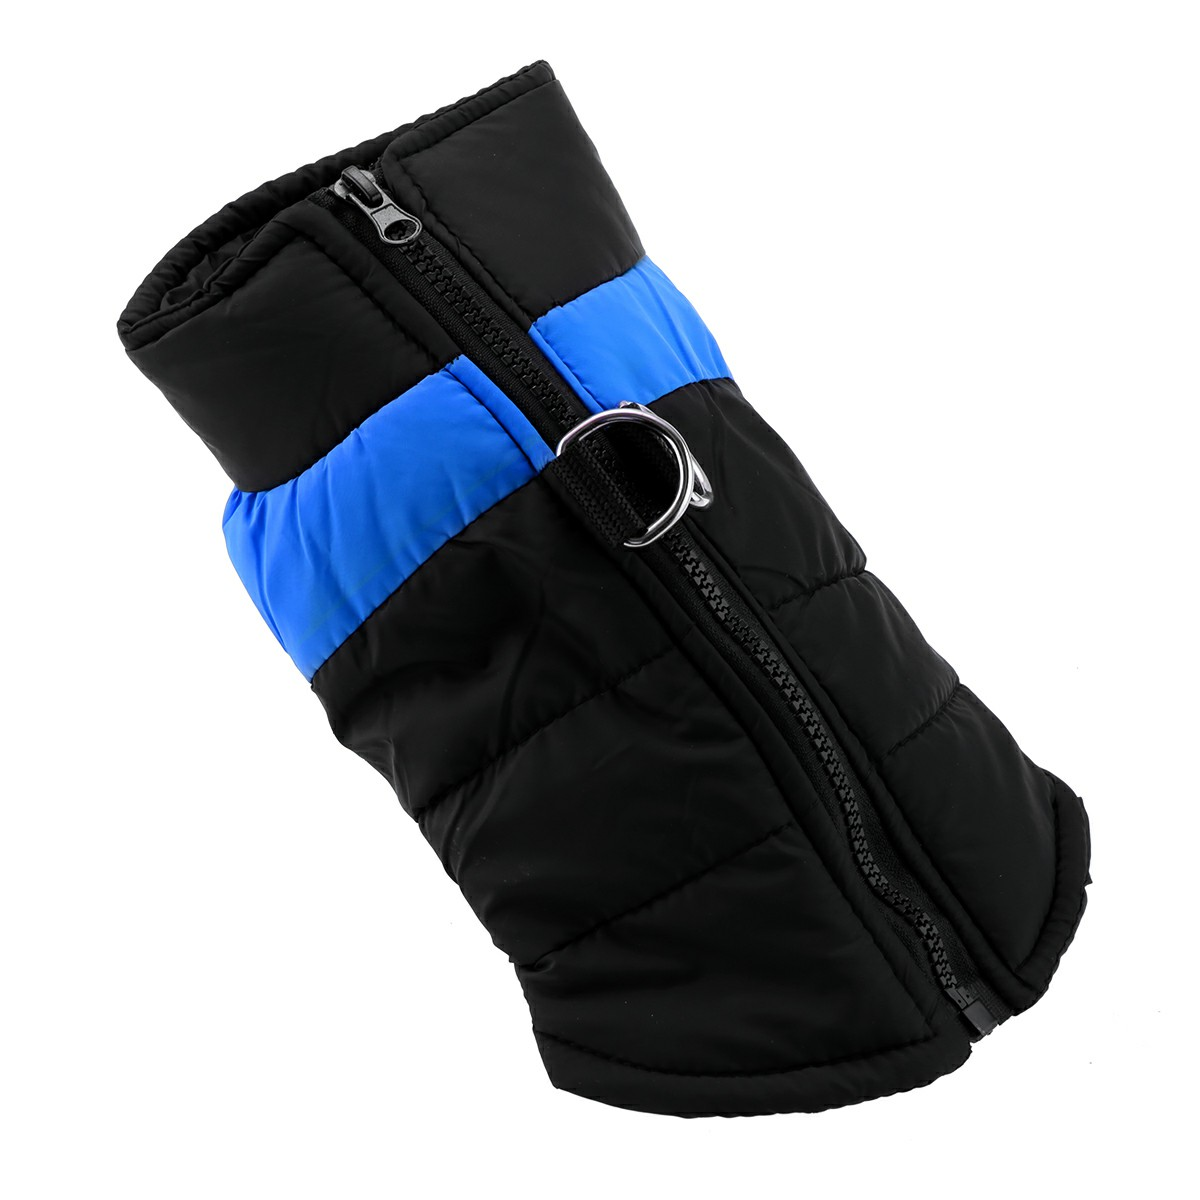 Comfy Soft Dog Vest Jacket Winter Waterproof Padded Pet Clothes Warm Vest Coat Size S - Blue